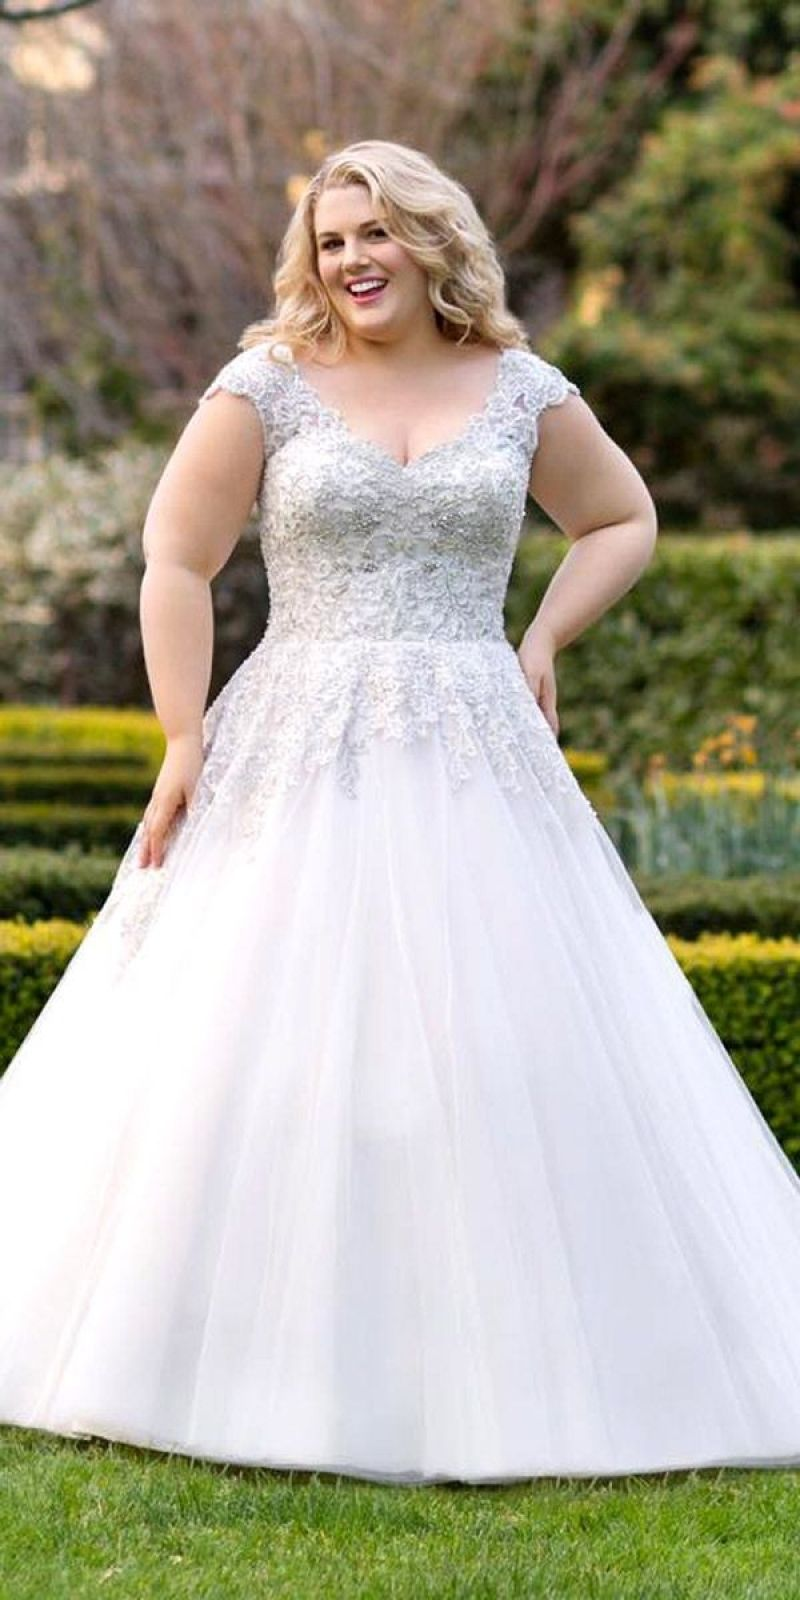 Amazing chubby wedding dress plus size wedding dresses pinterest